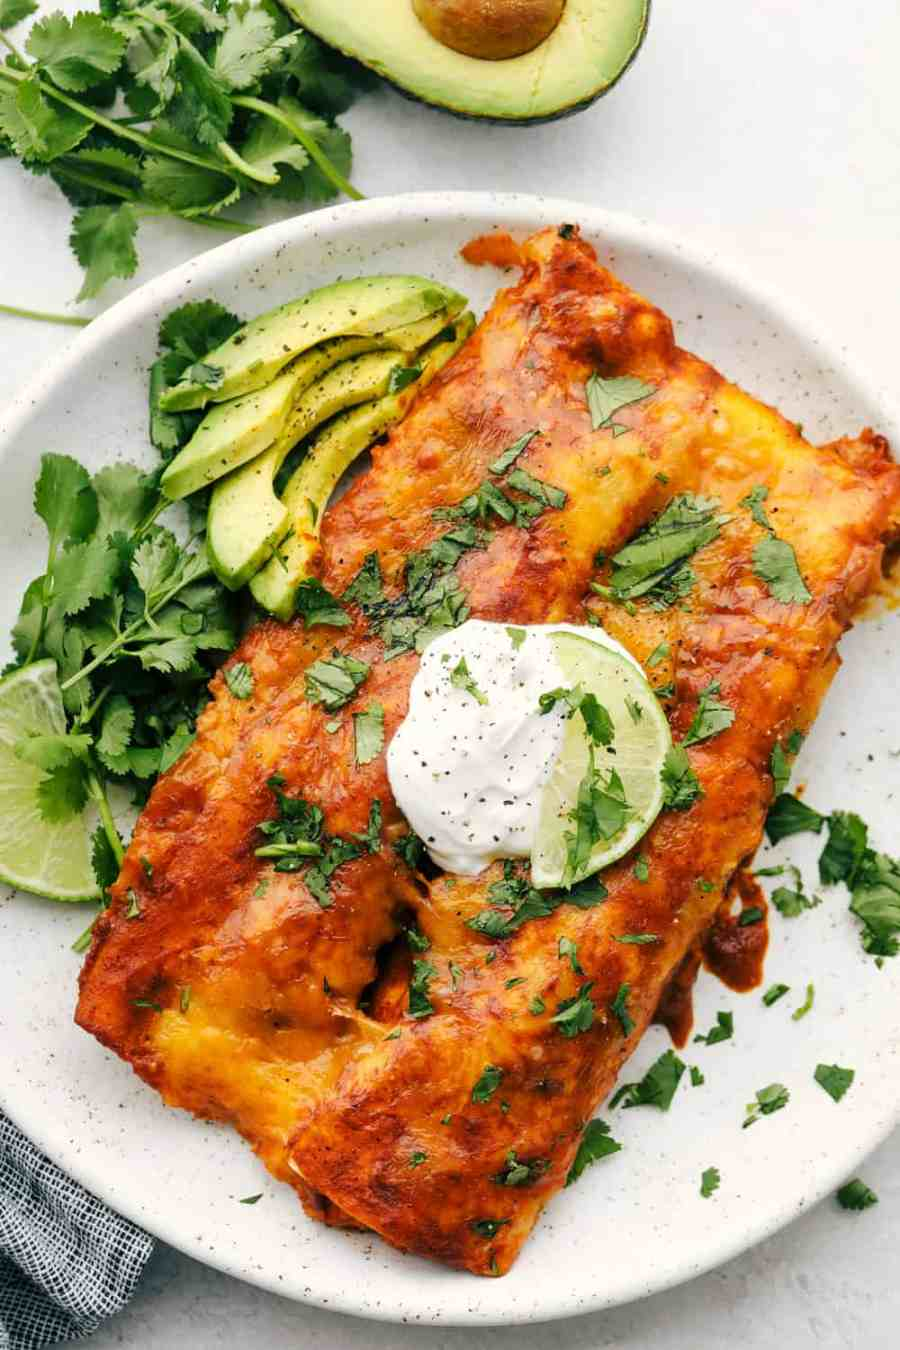 Enchiladas on a plate with sour cream and sliced avocados.